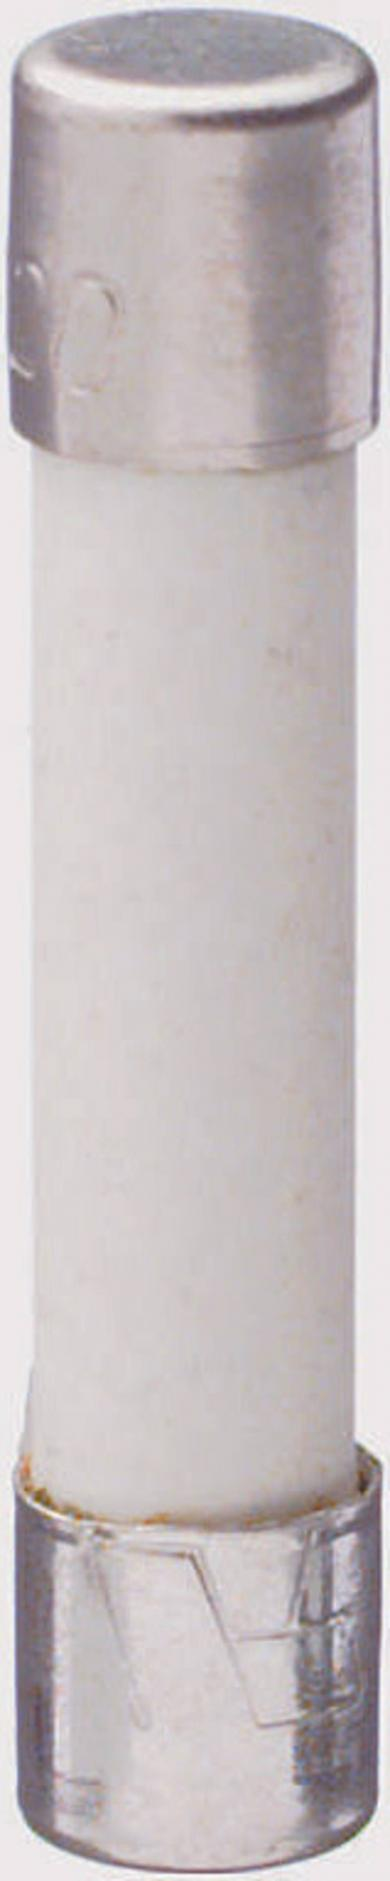 Siguranţă 6,4 x 31,8 mm ultrarapidă -FF- Eska tip GBB, 250 V/AC, 125 V/DC, 30 A